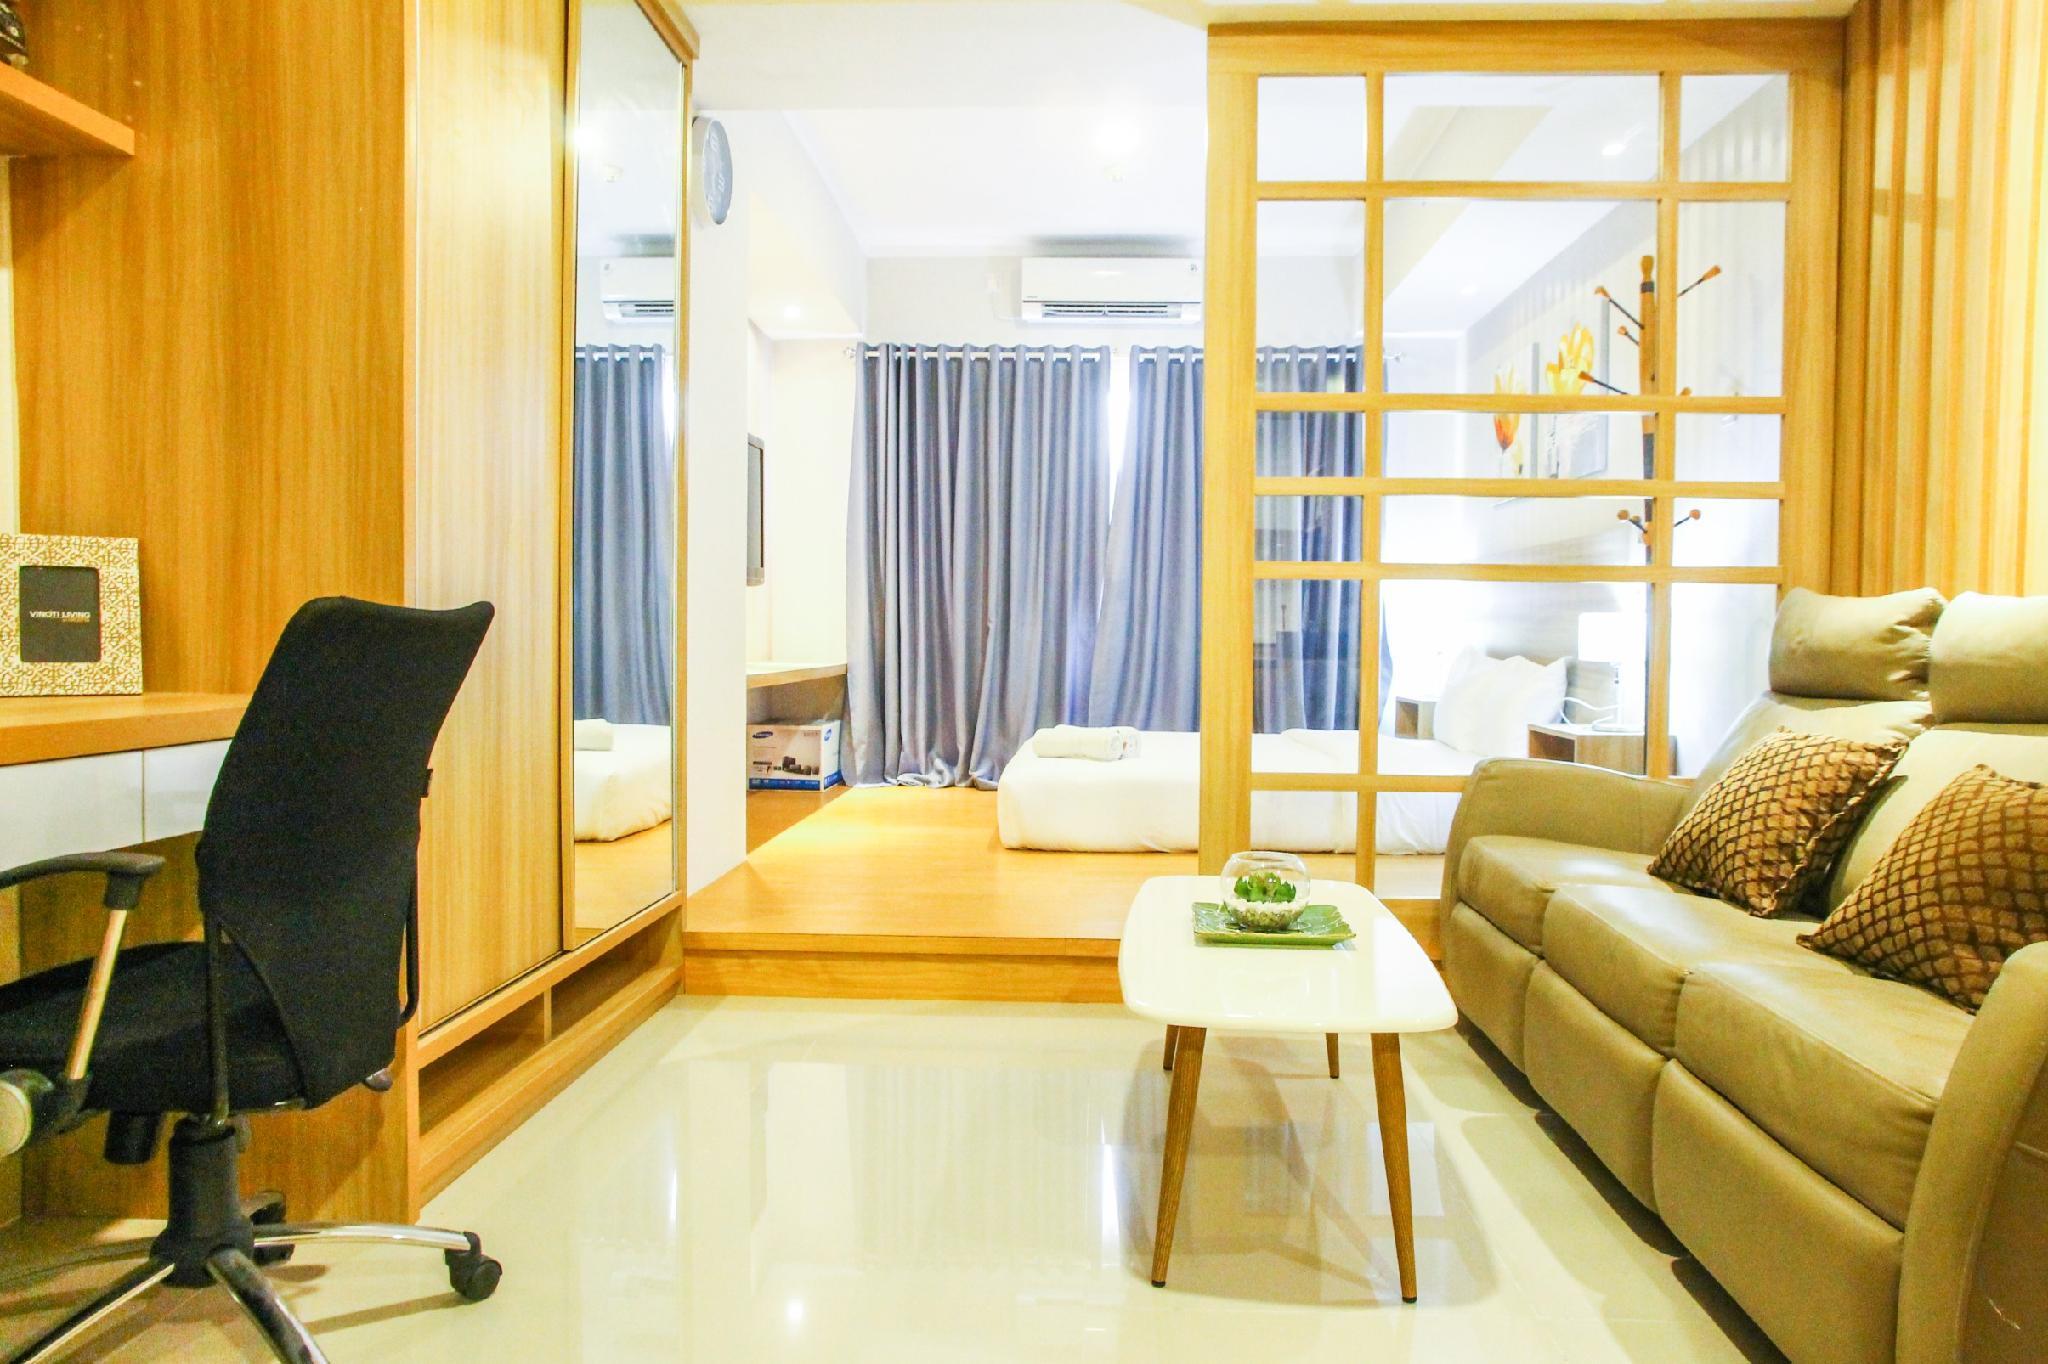 Japanese Style Studio The Oasis Apt By Travelio